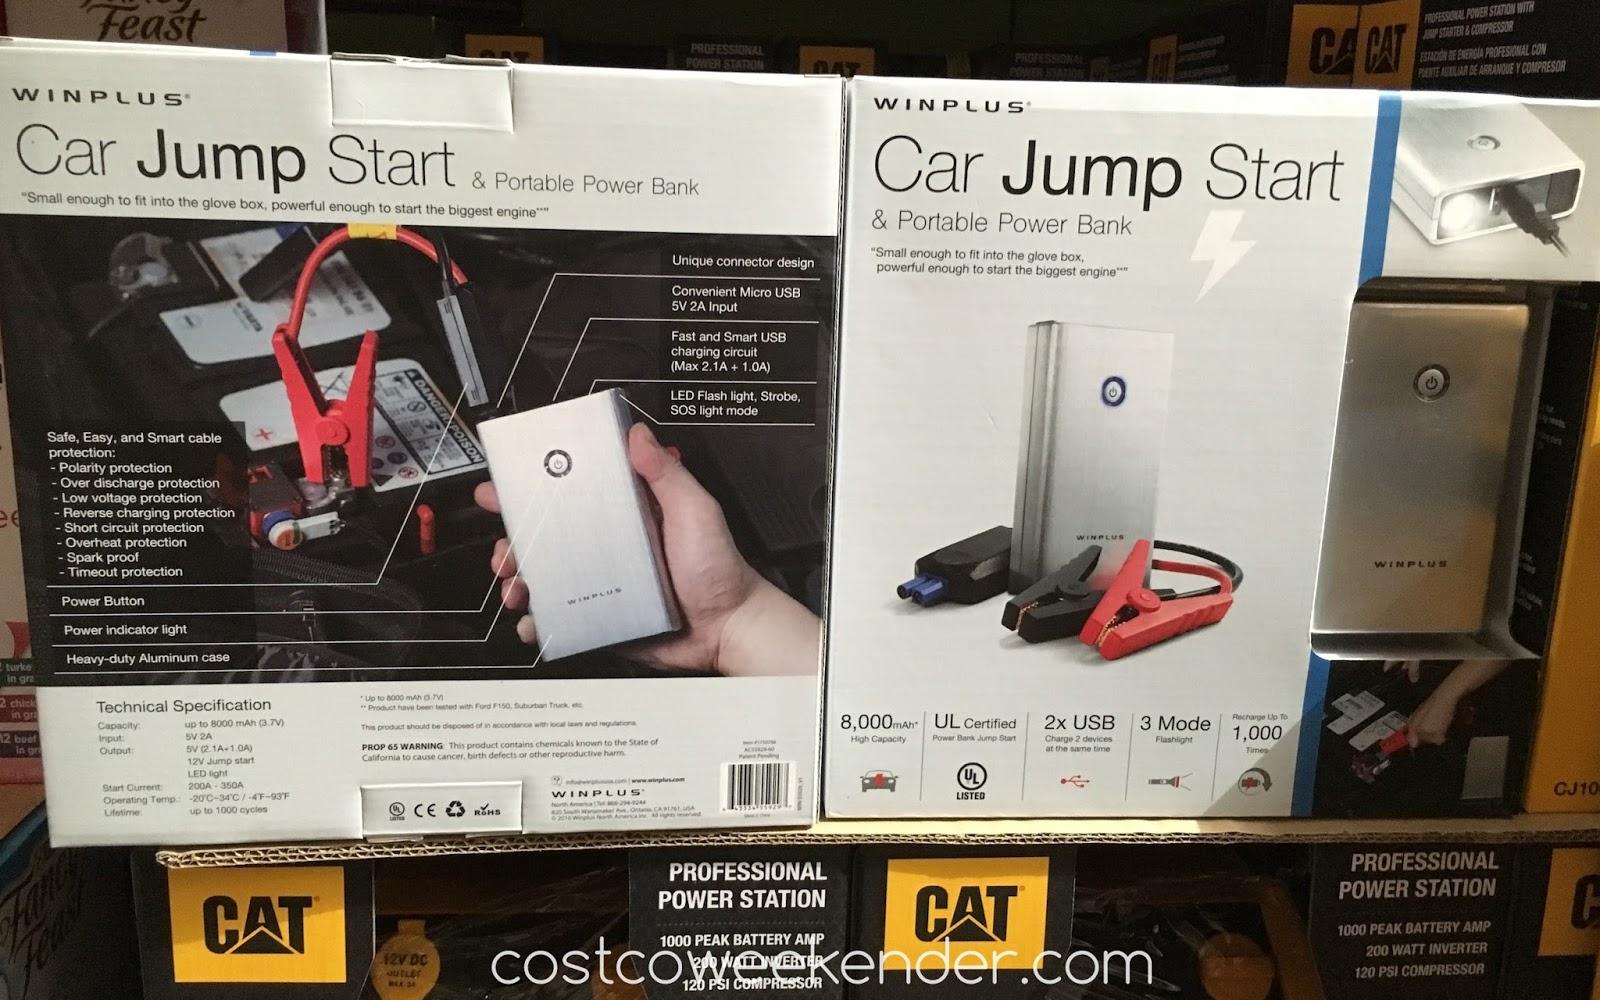 Winplus Car Jump Start Portable Power Bank Costco Weekender